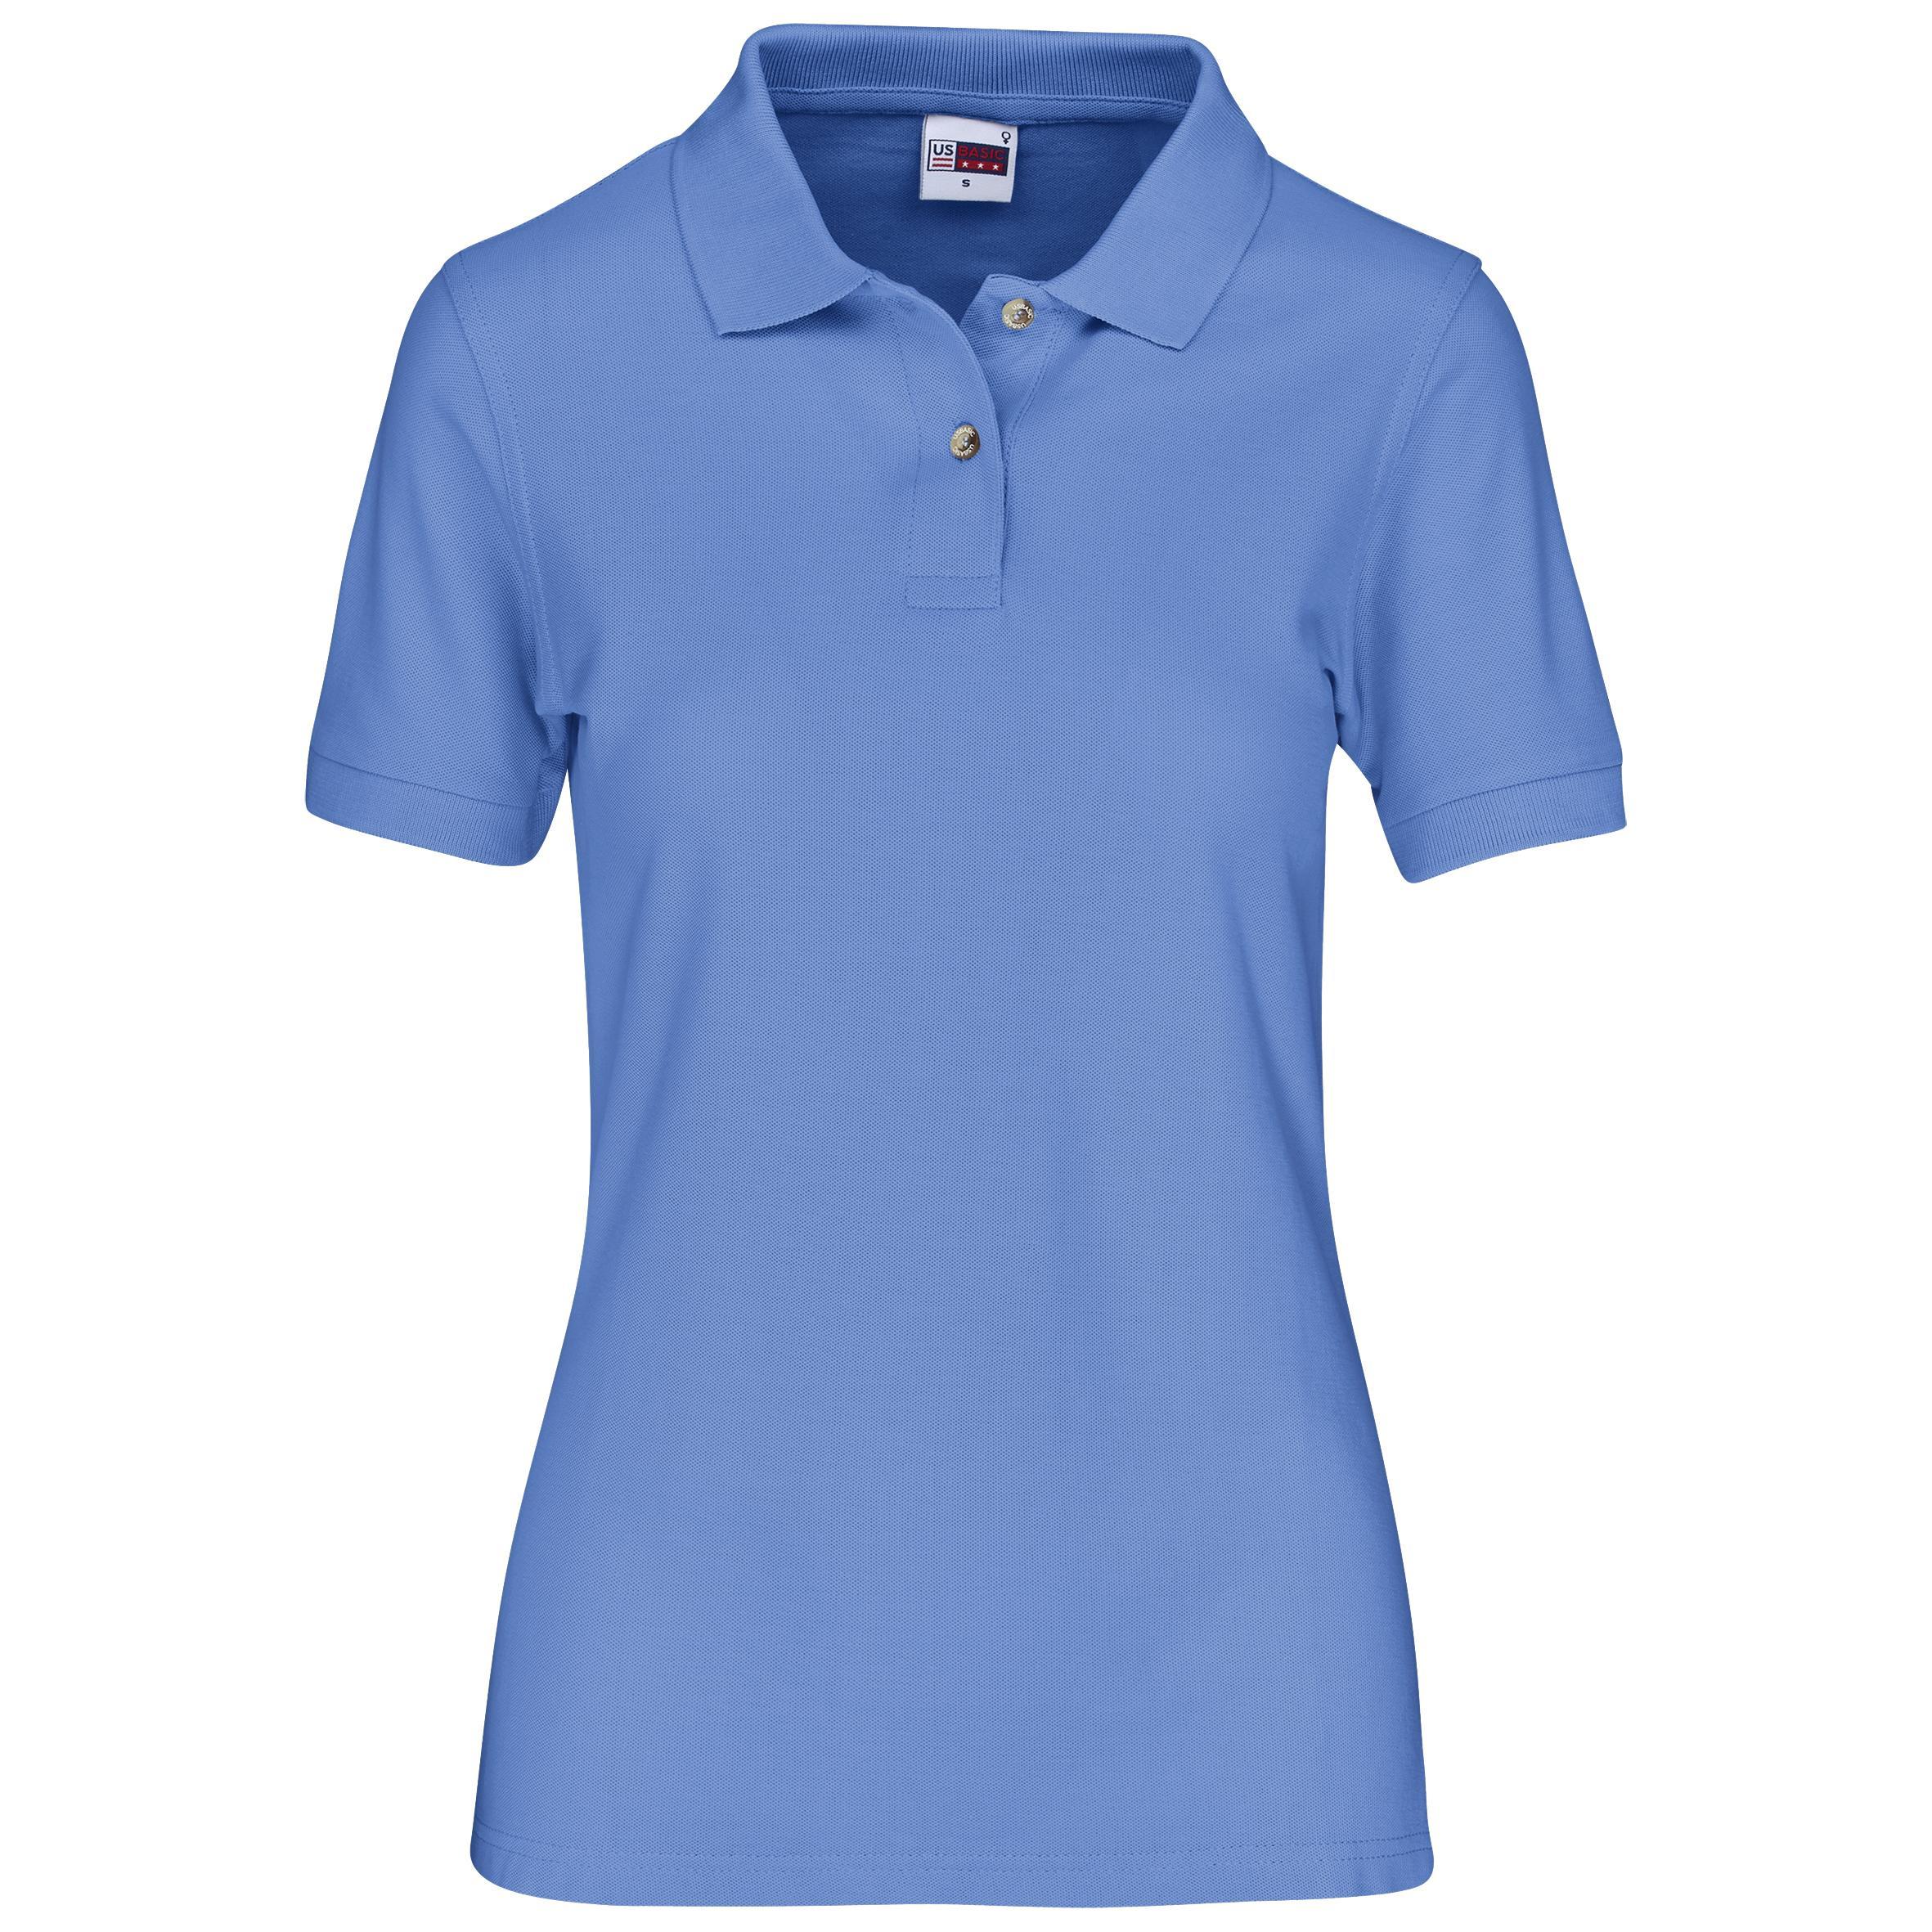 Ladies Boston Golf Shirt - Ocean Blue Only